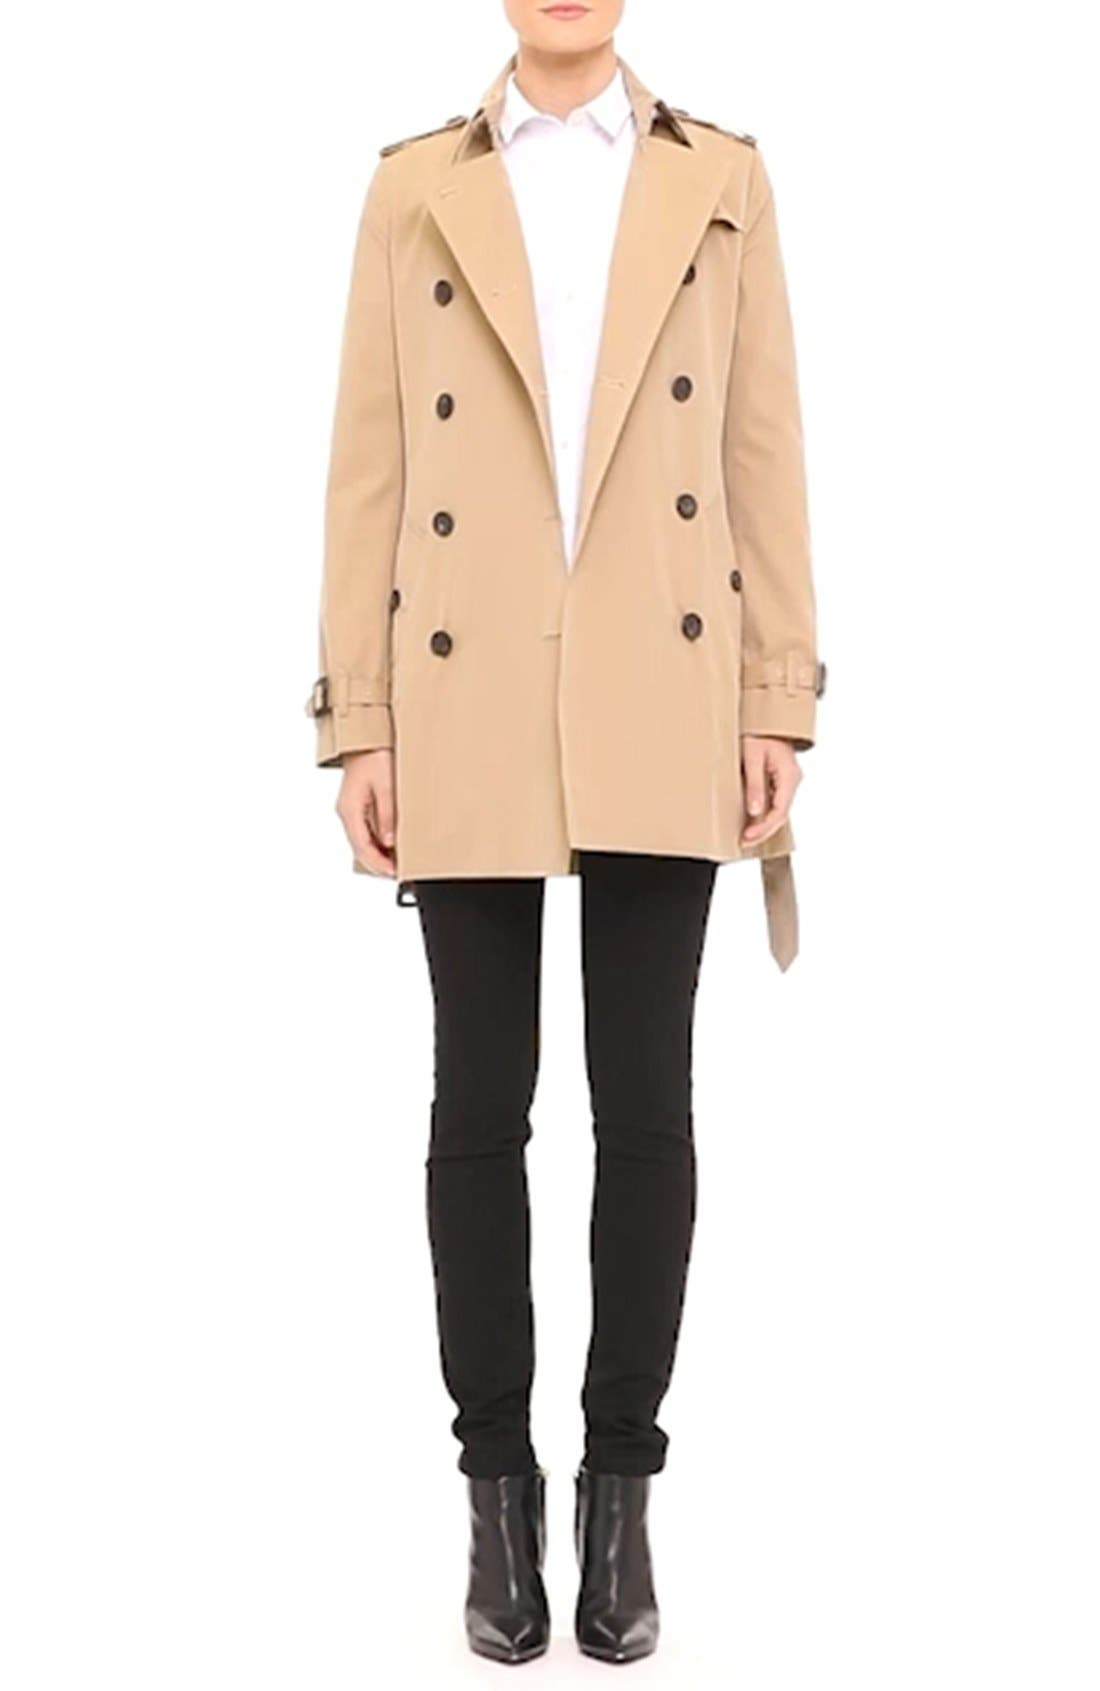 Kensington Short Trench Coat,                             Alternate thumbnail 5, color,                             HONEY